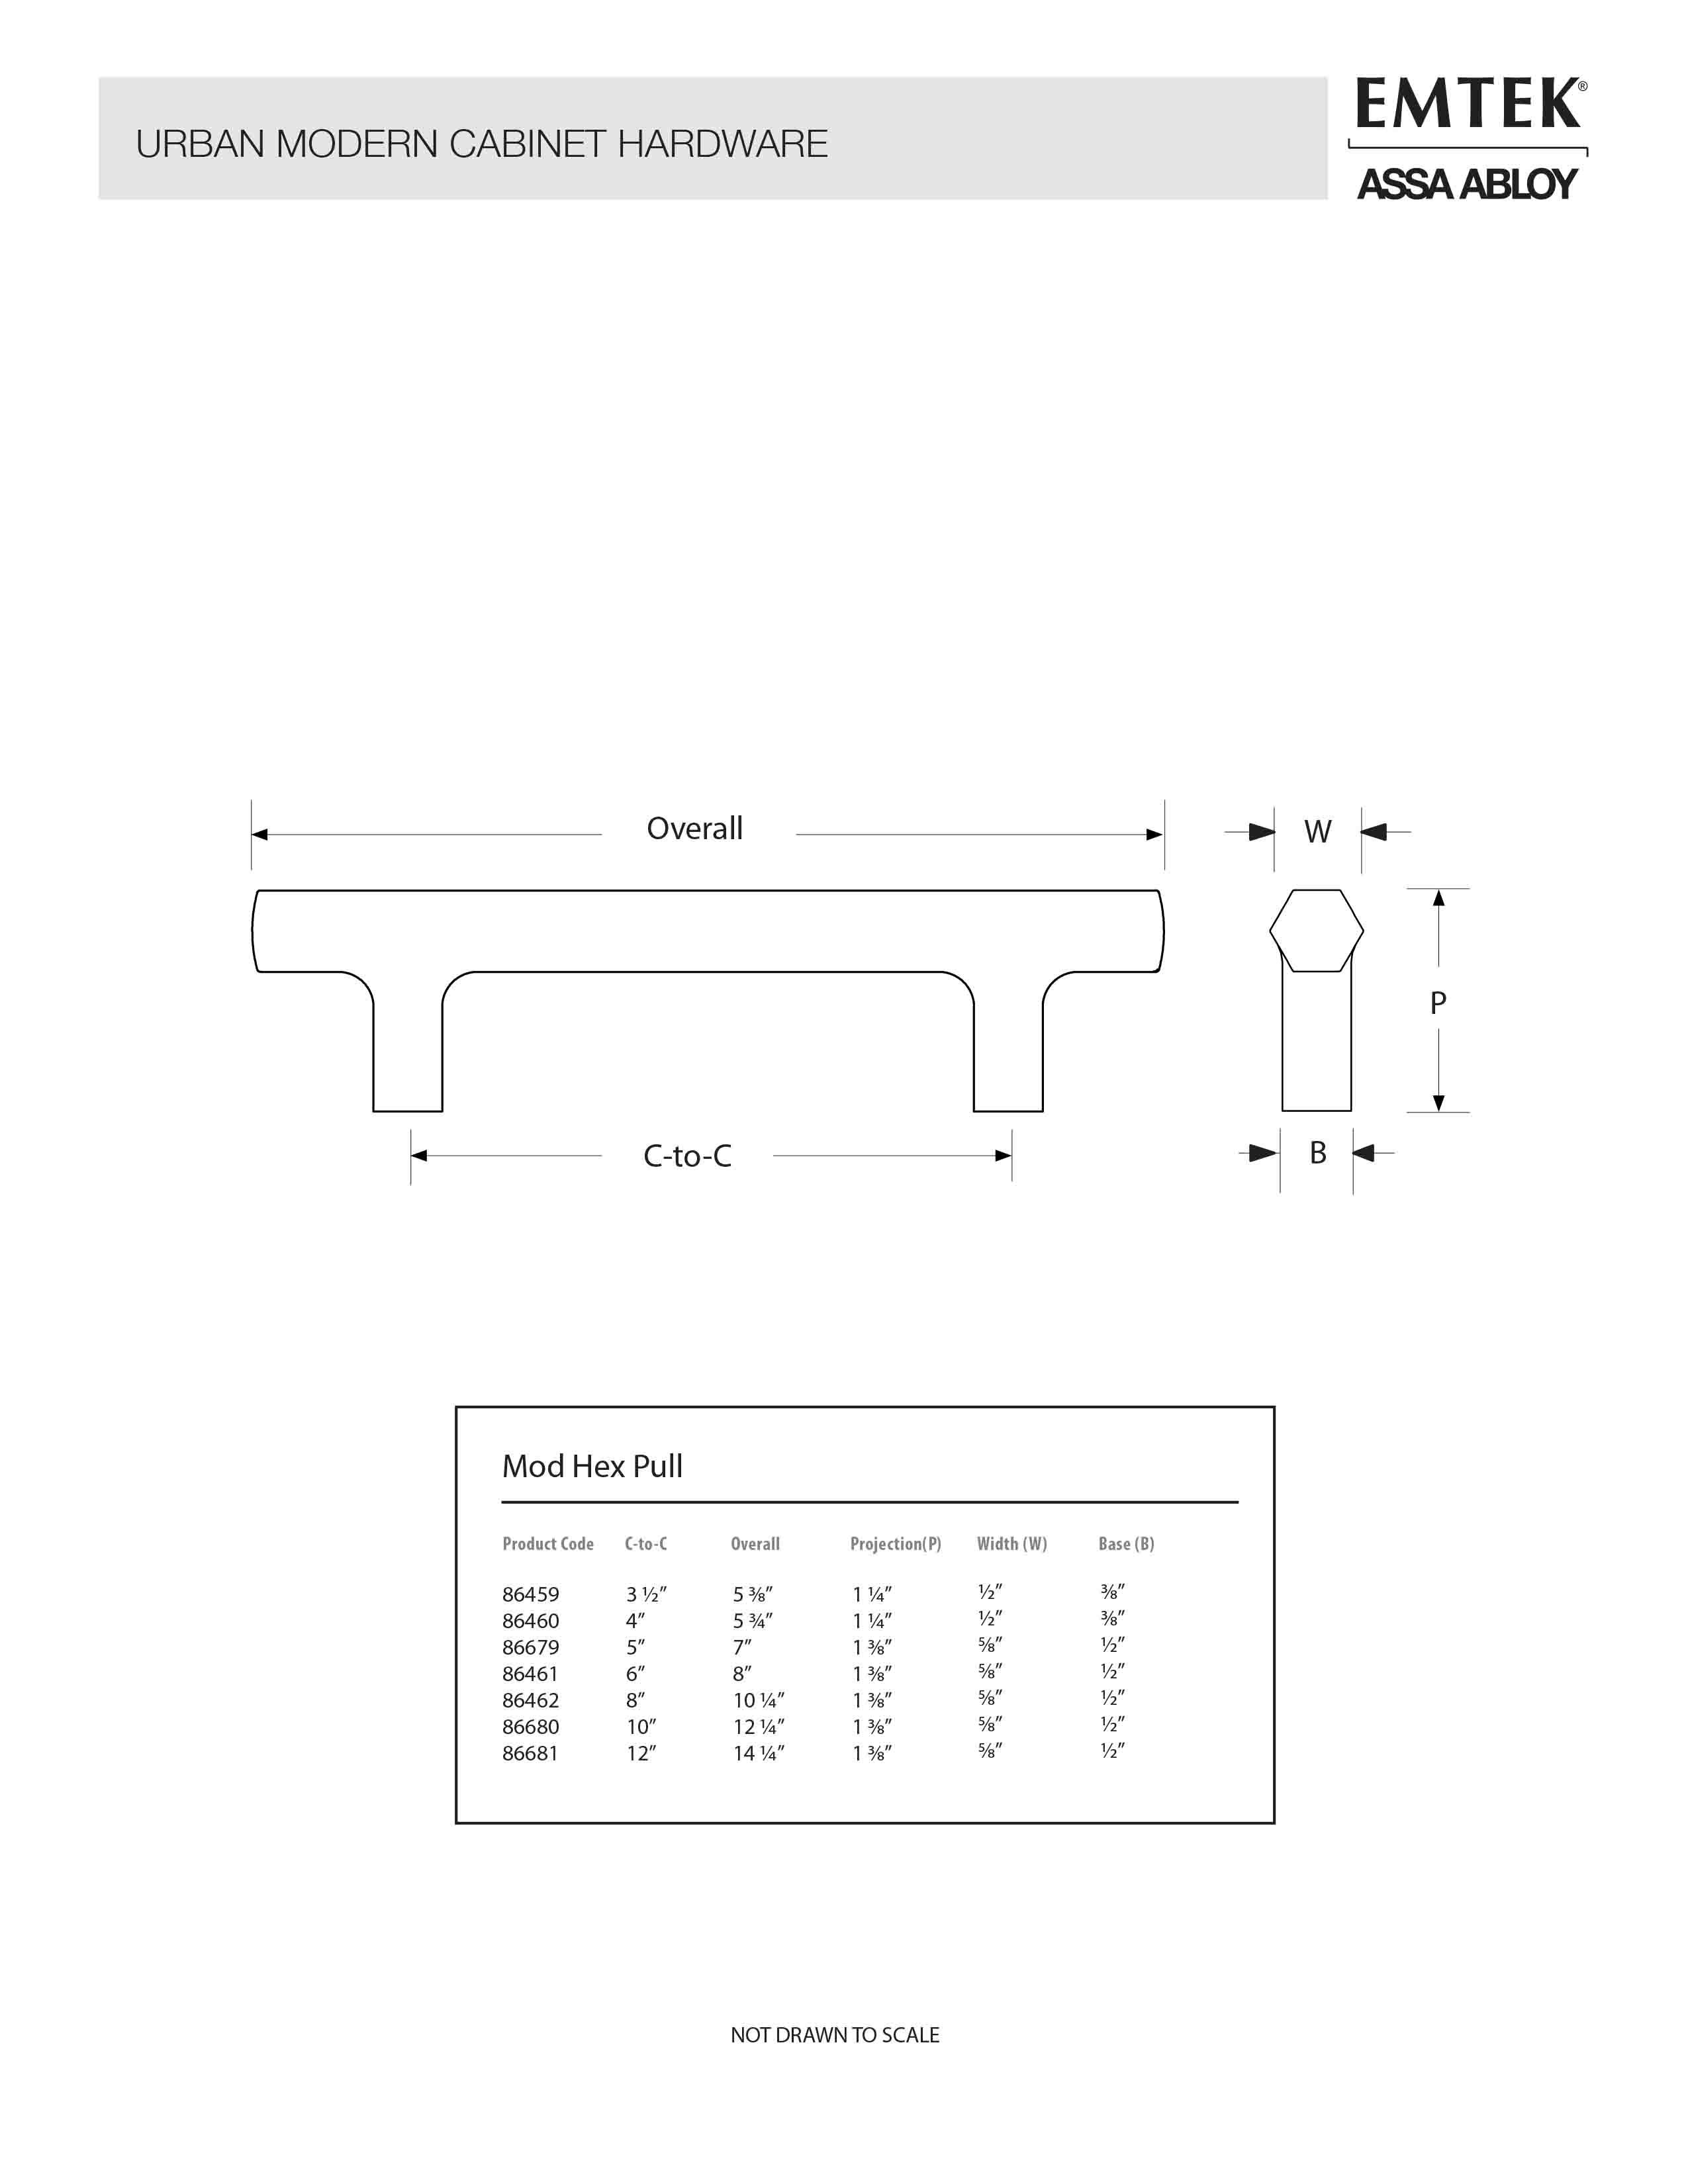 emtek-mod-hex-pull-sheet